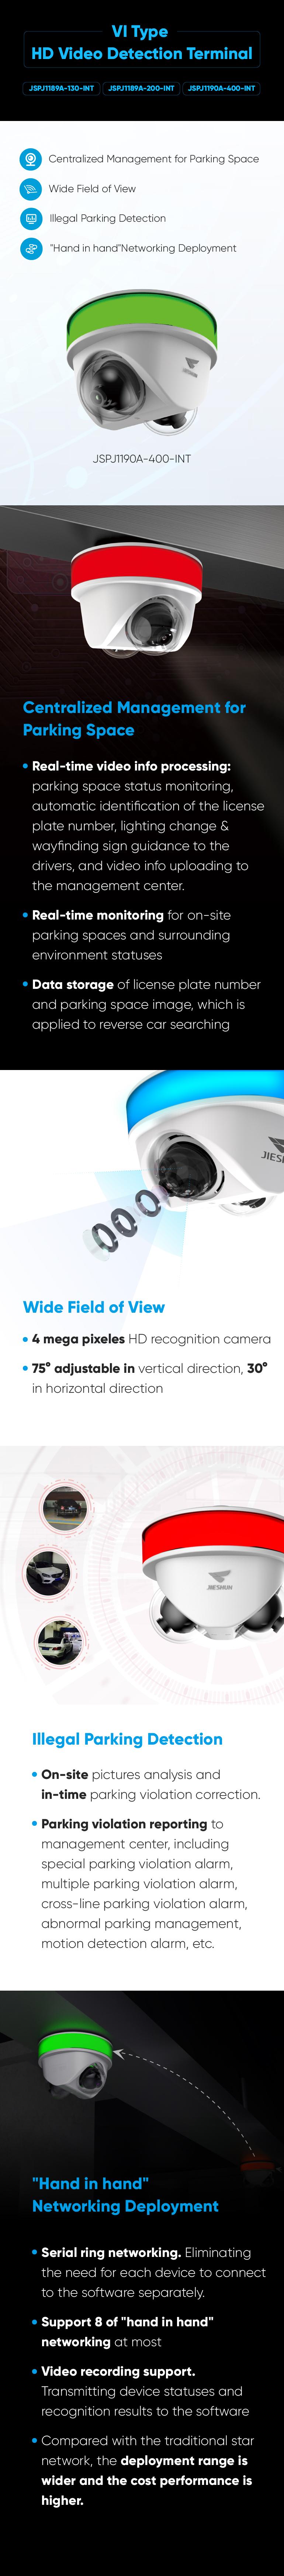 VI Video Detection Camera.jpg